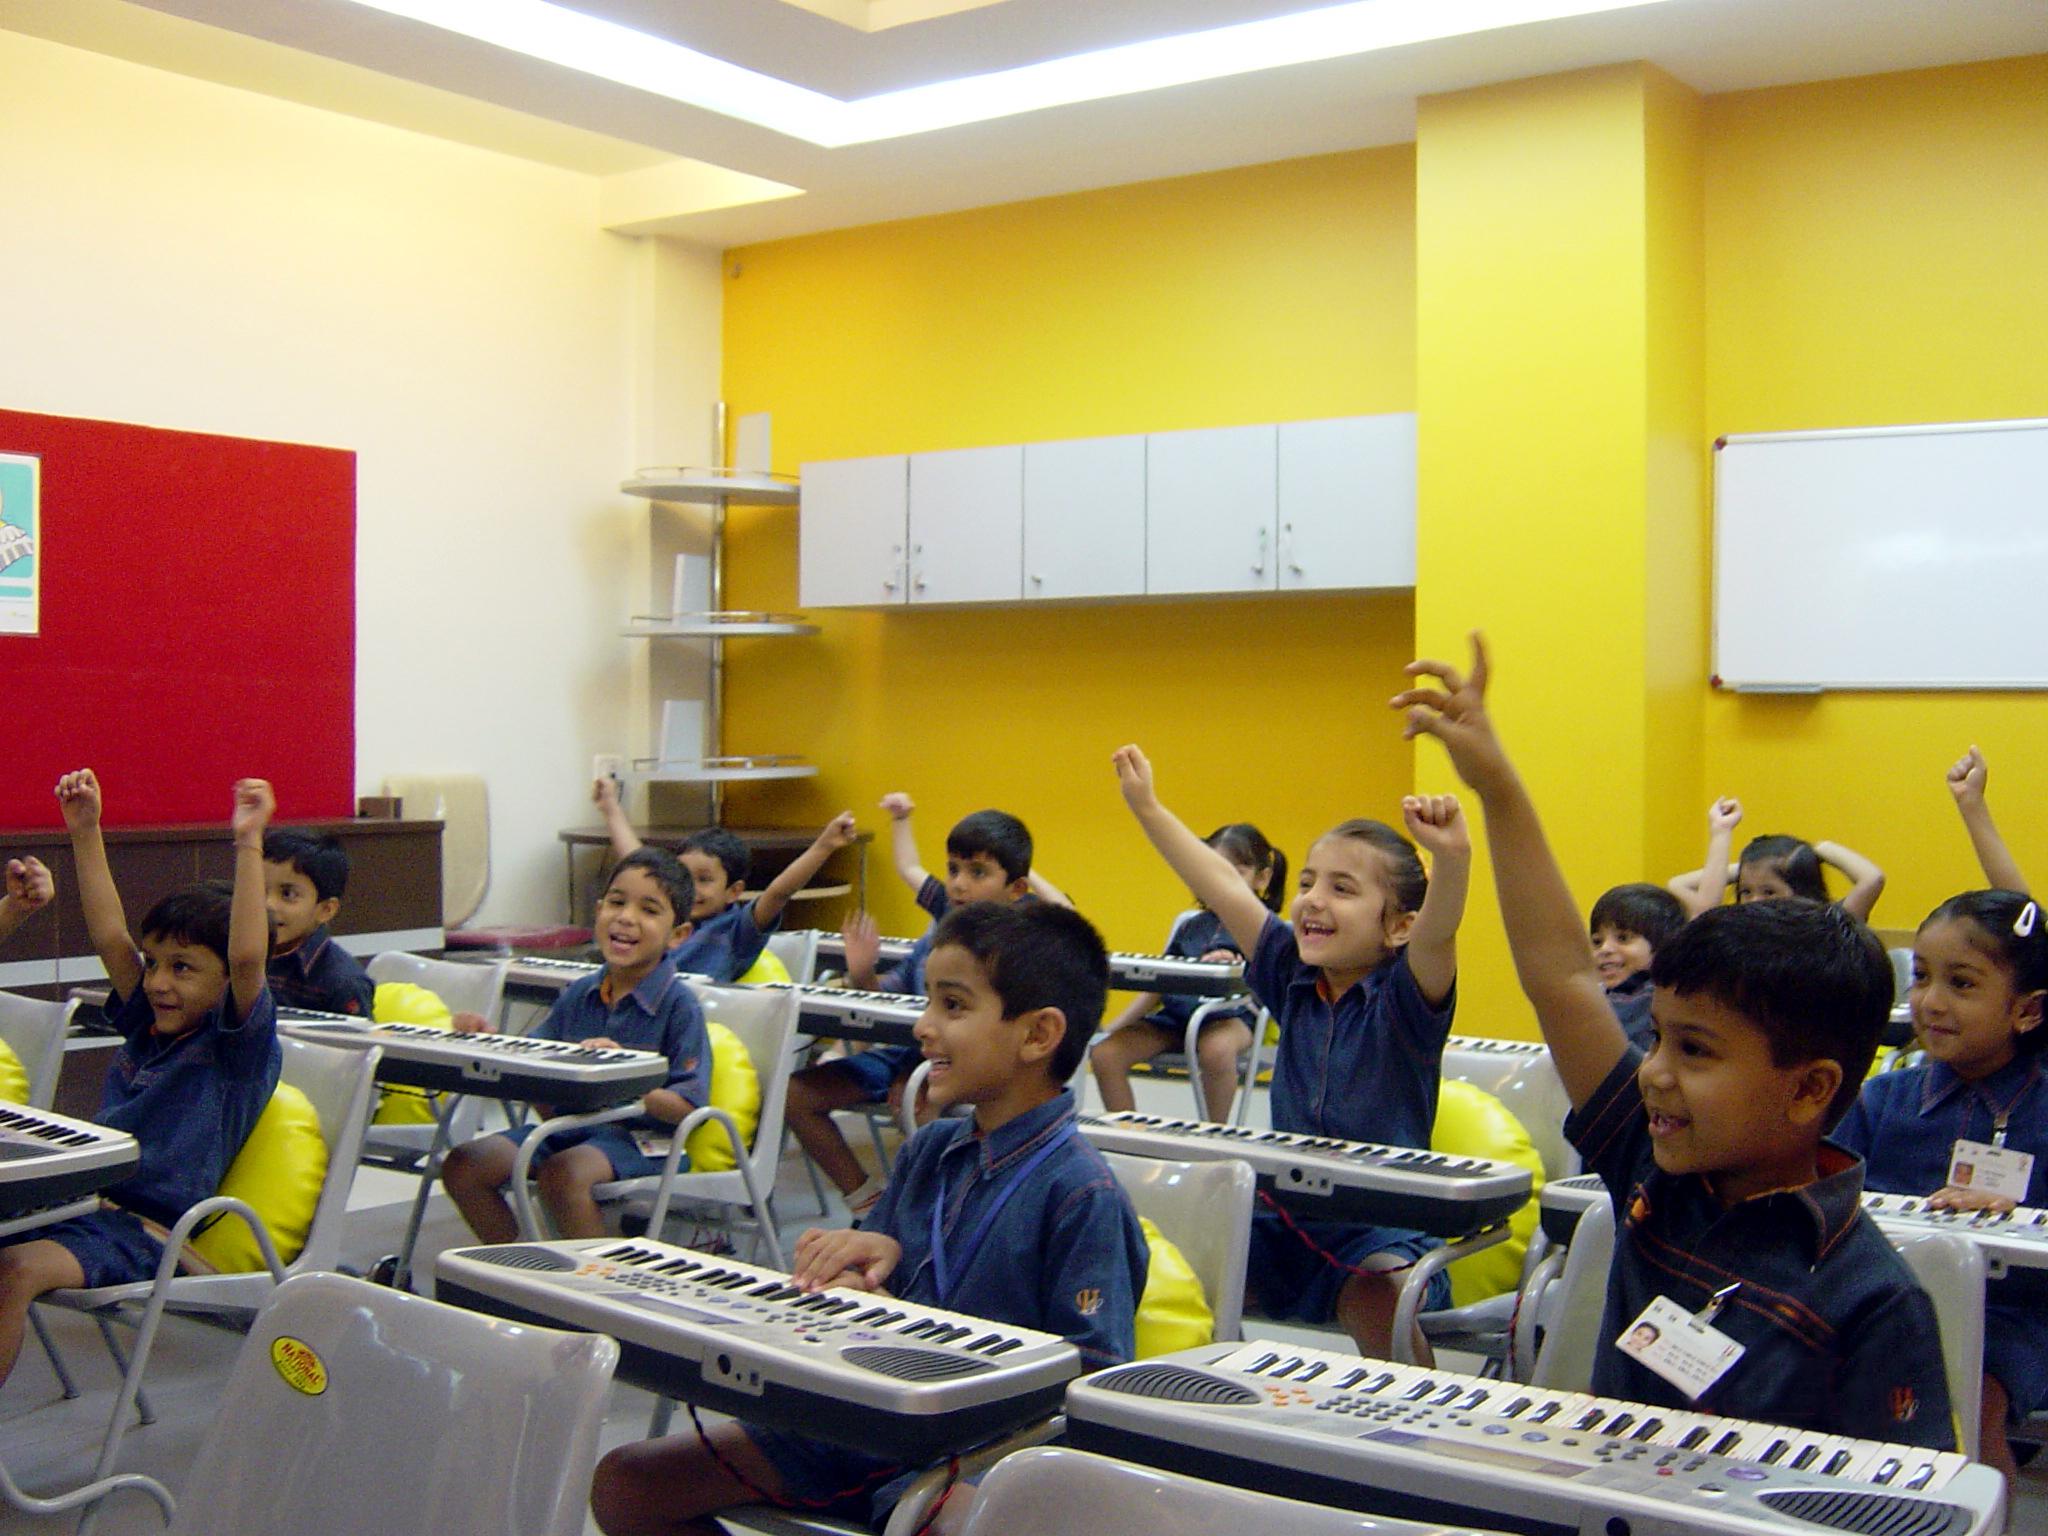 Boss School of Music - Wikipedia